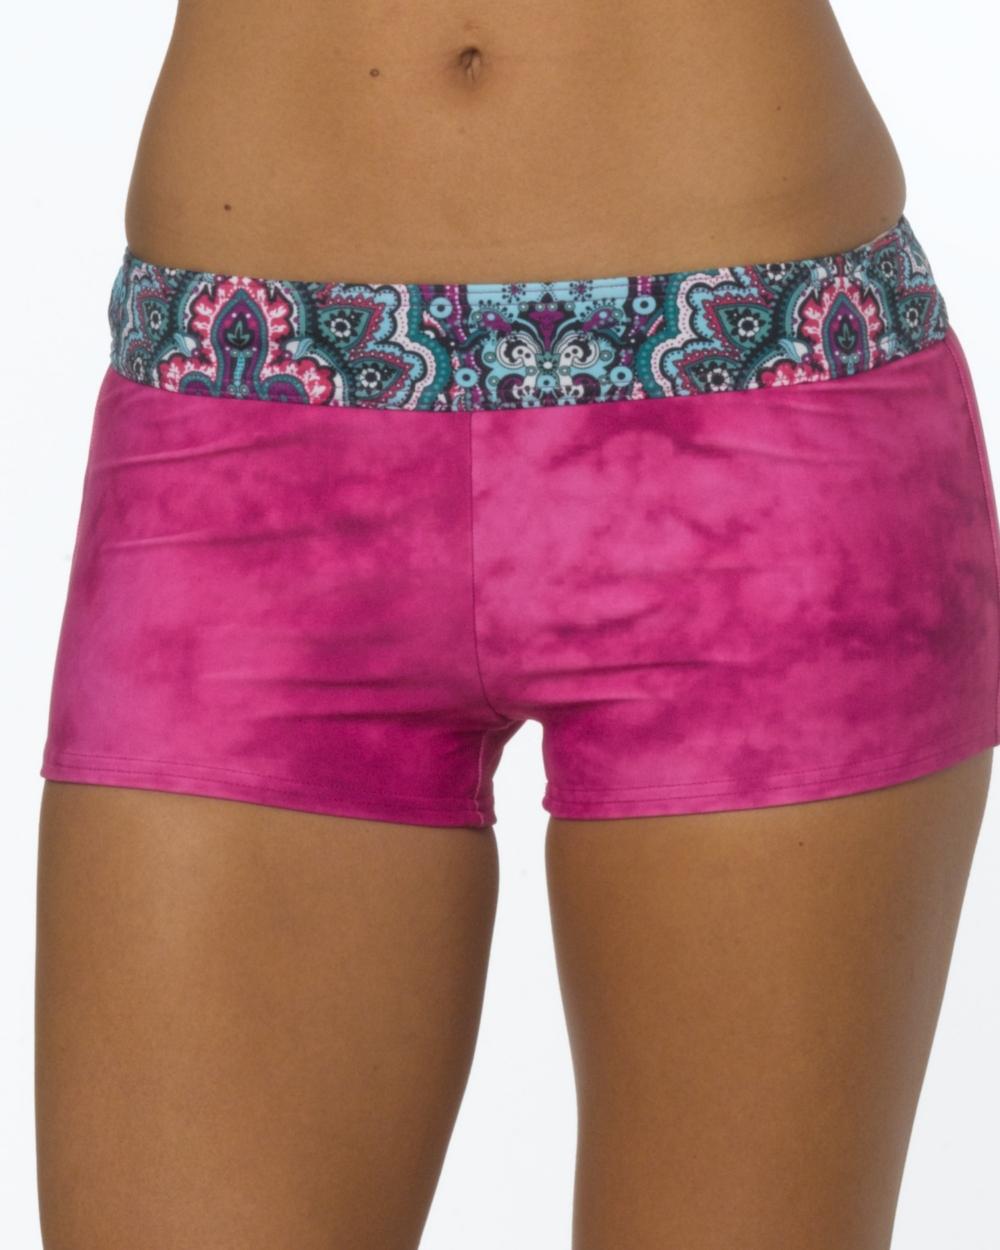 2015 Prana Activewear Raya Bottom in Fuchsia Namaste